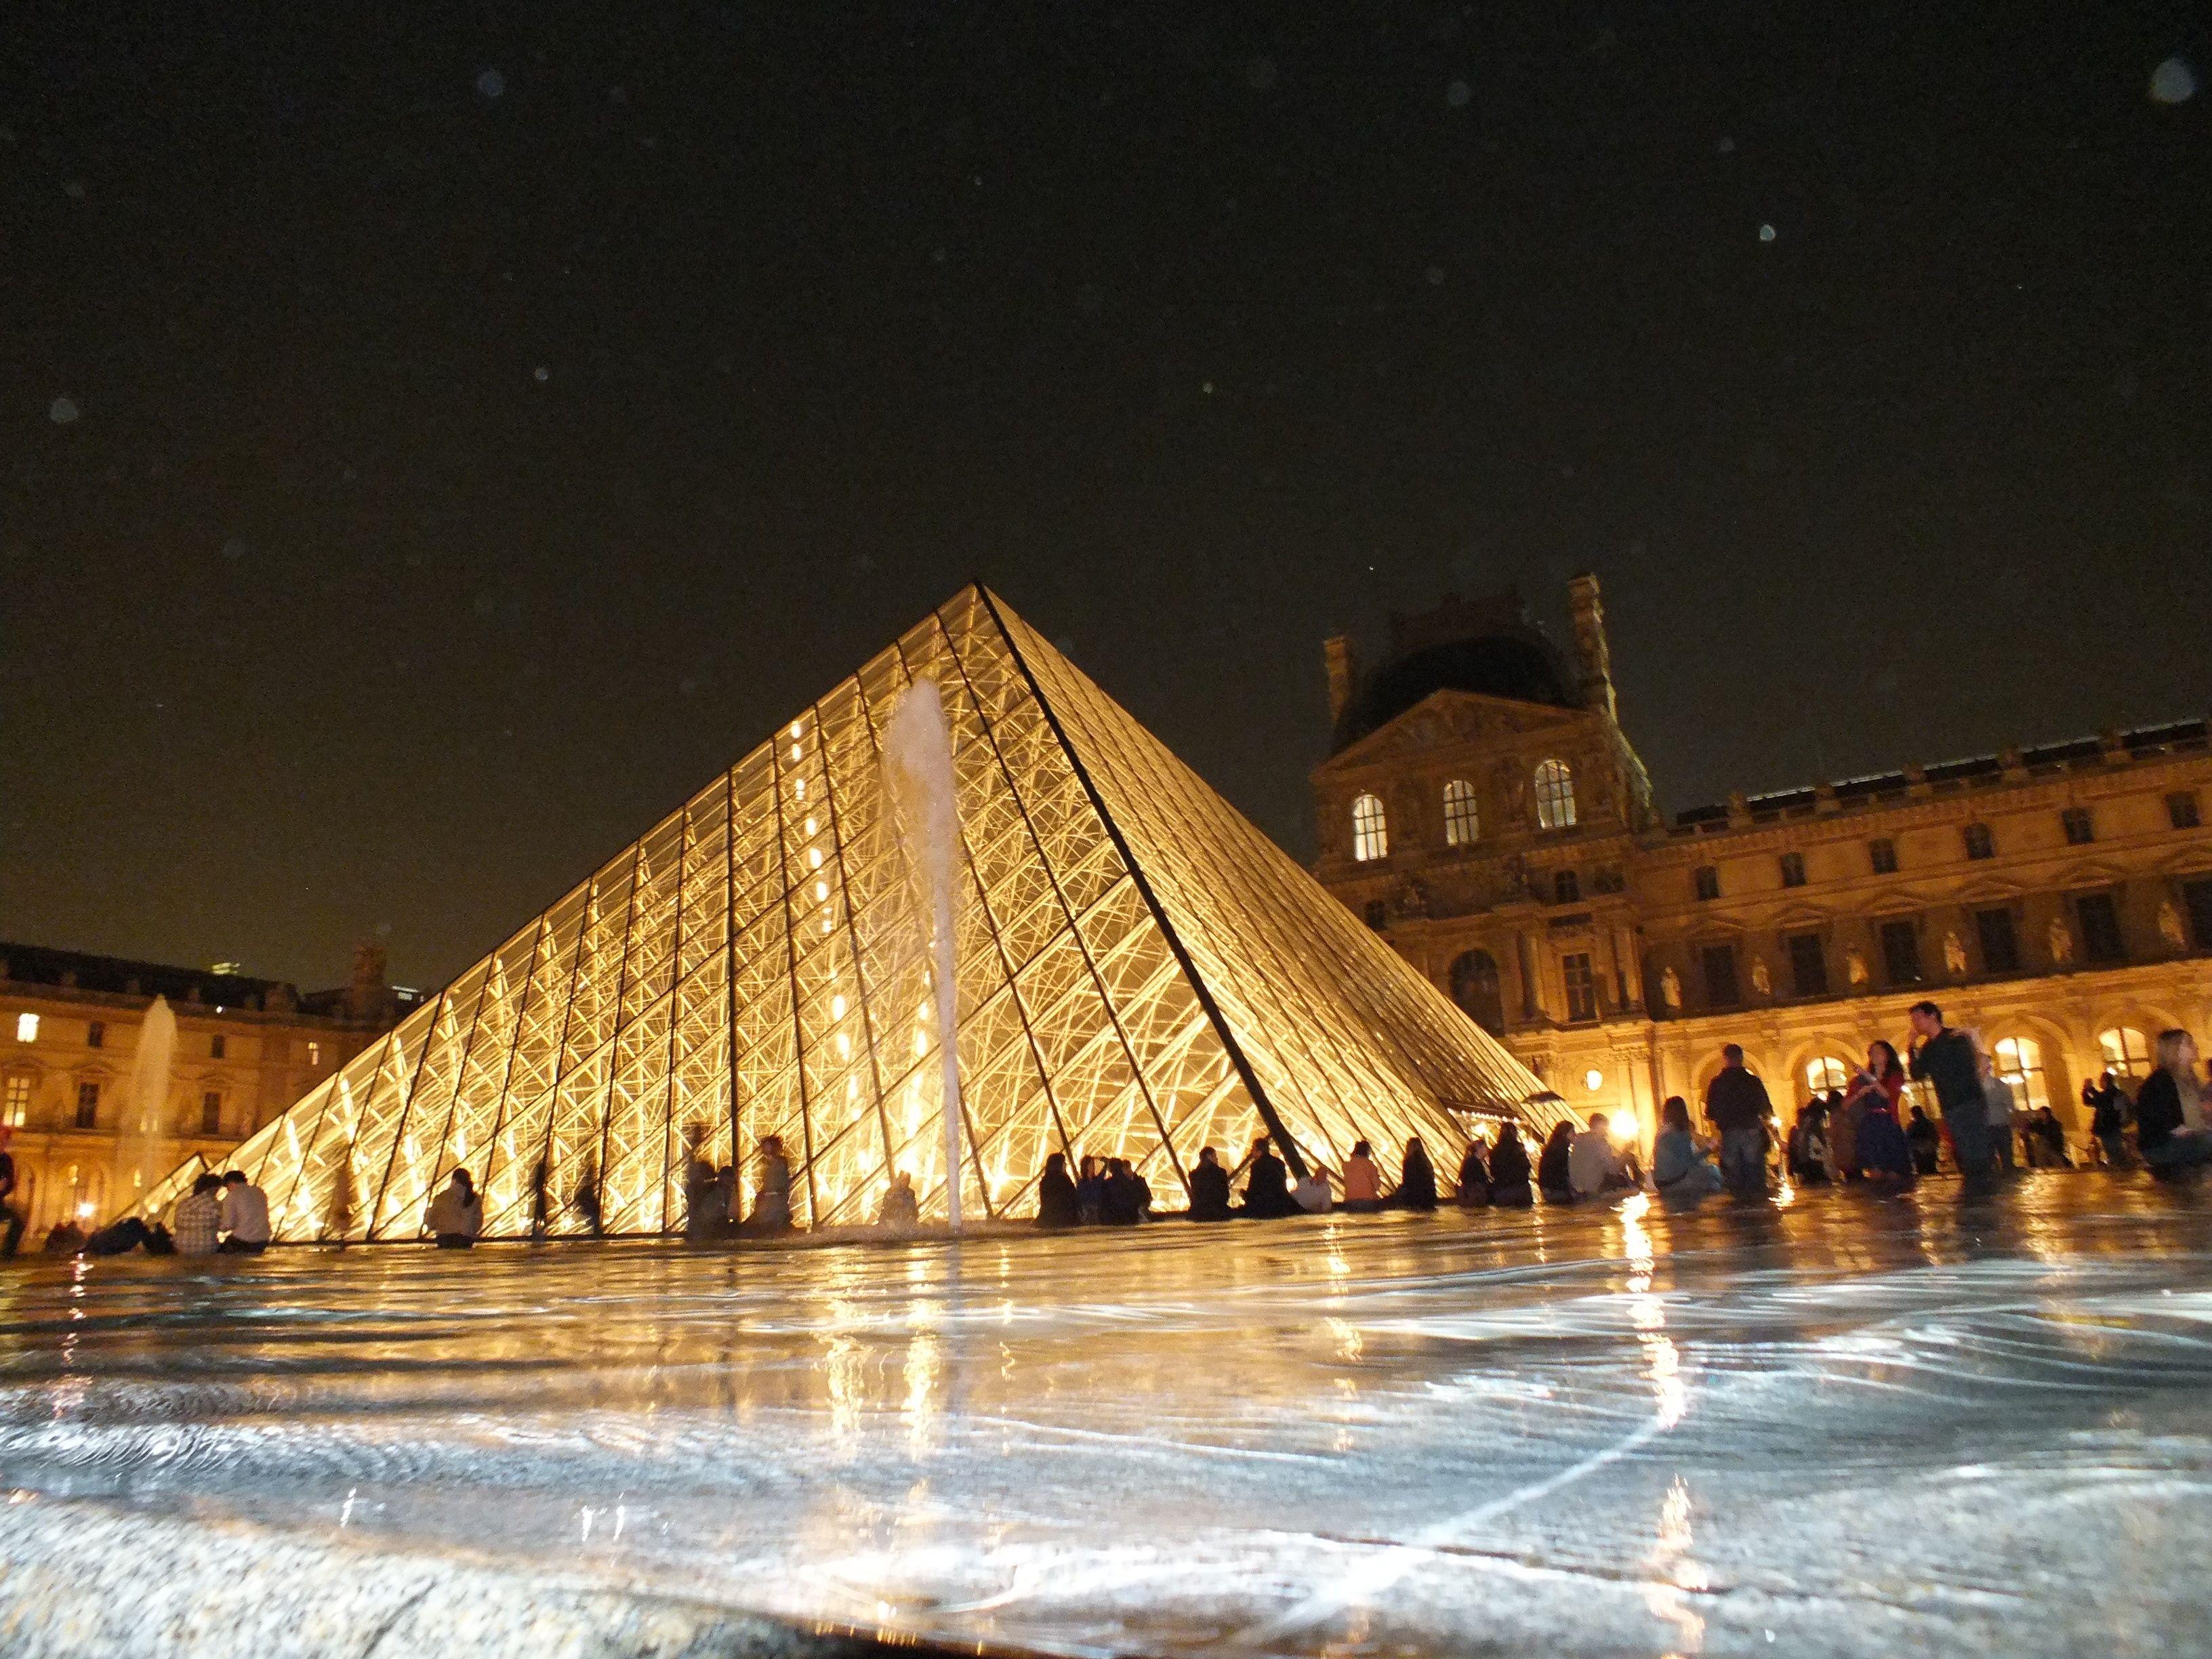 Pirâmide maior do Louvre